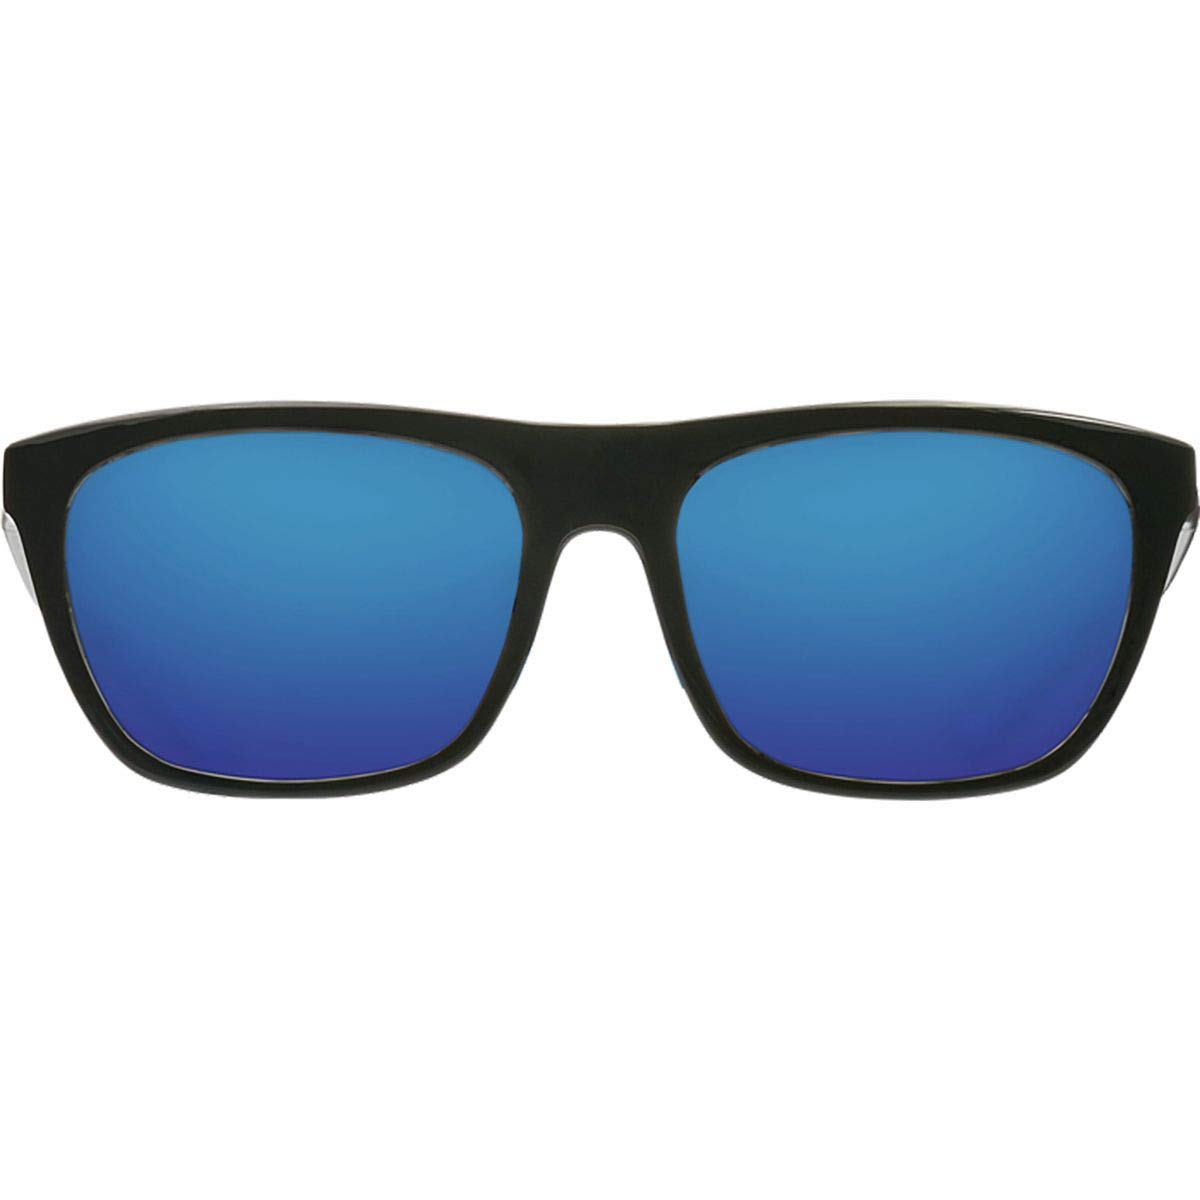 a417563706 Amazon.com  Costa Del Mar - Cheeca - Matte Shadow Tortoise Frame-Grey 580  Poly Polarized Lenses  Clothing